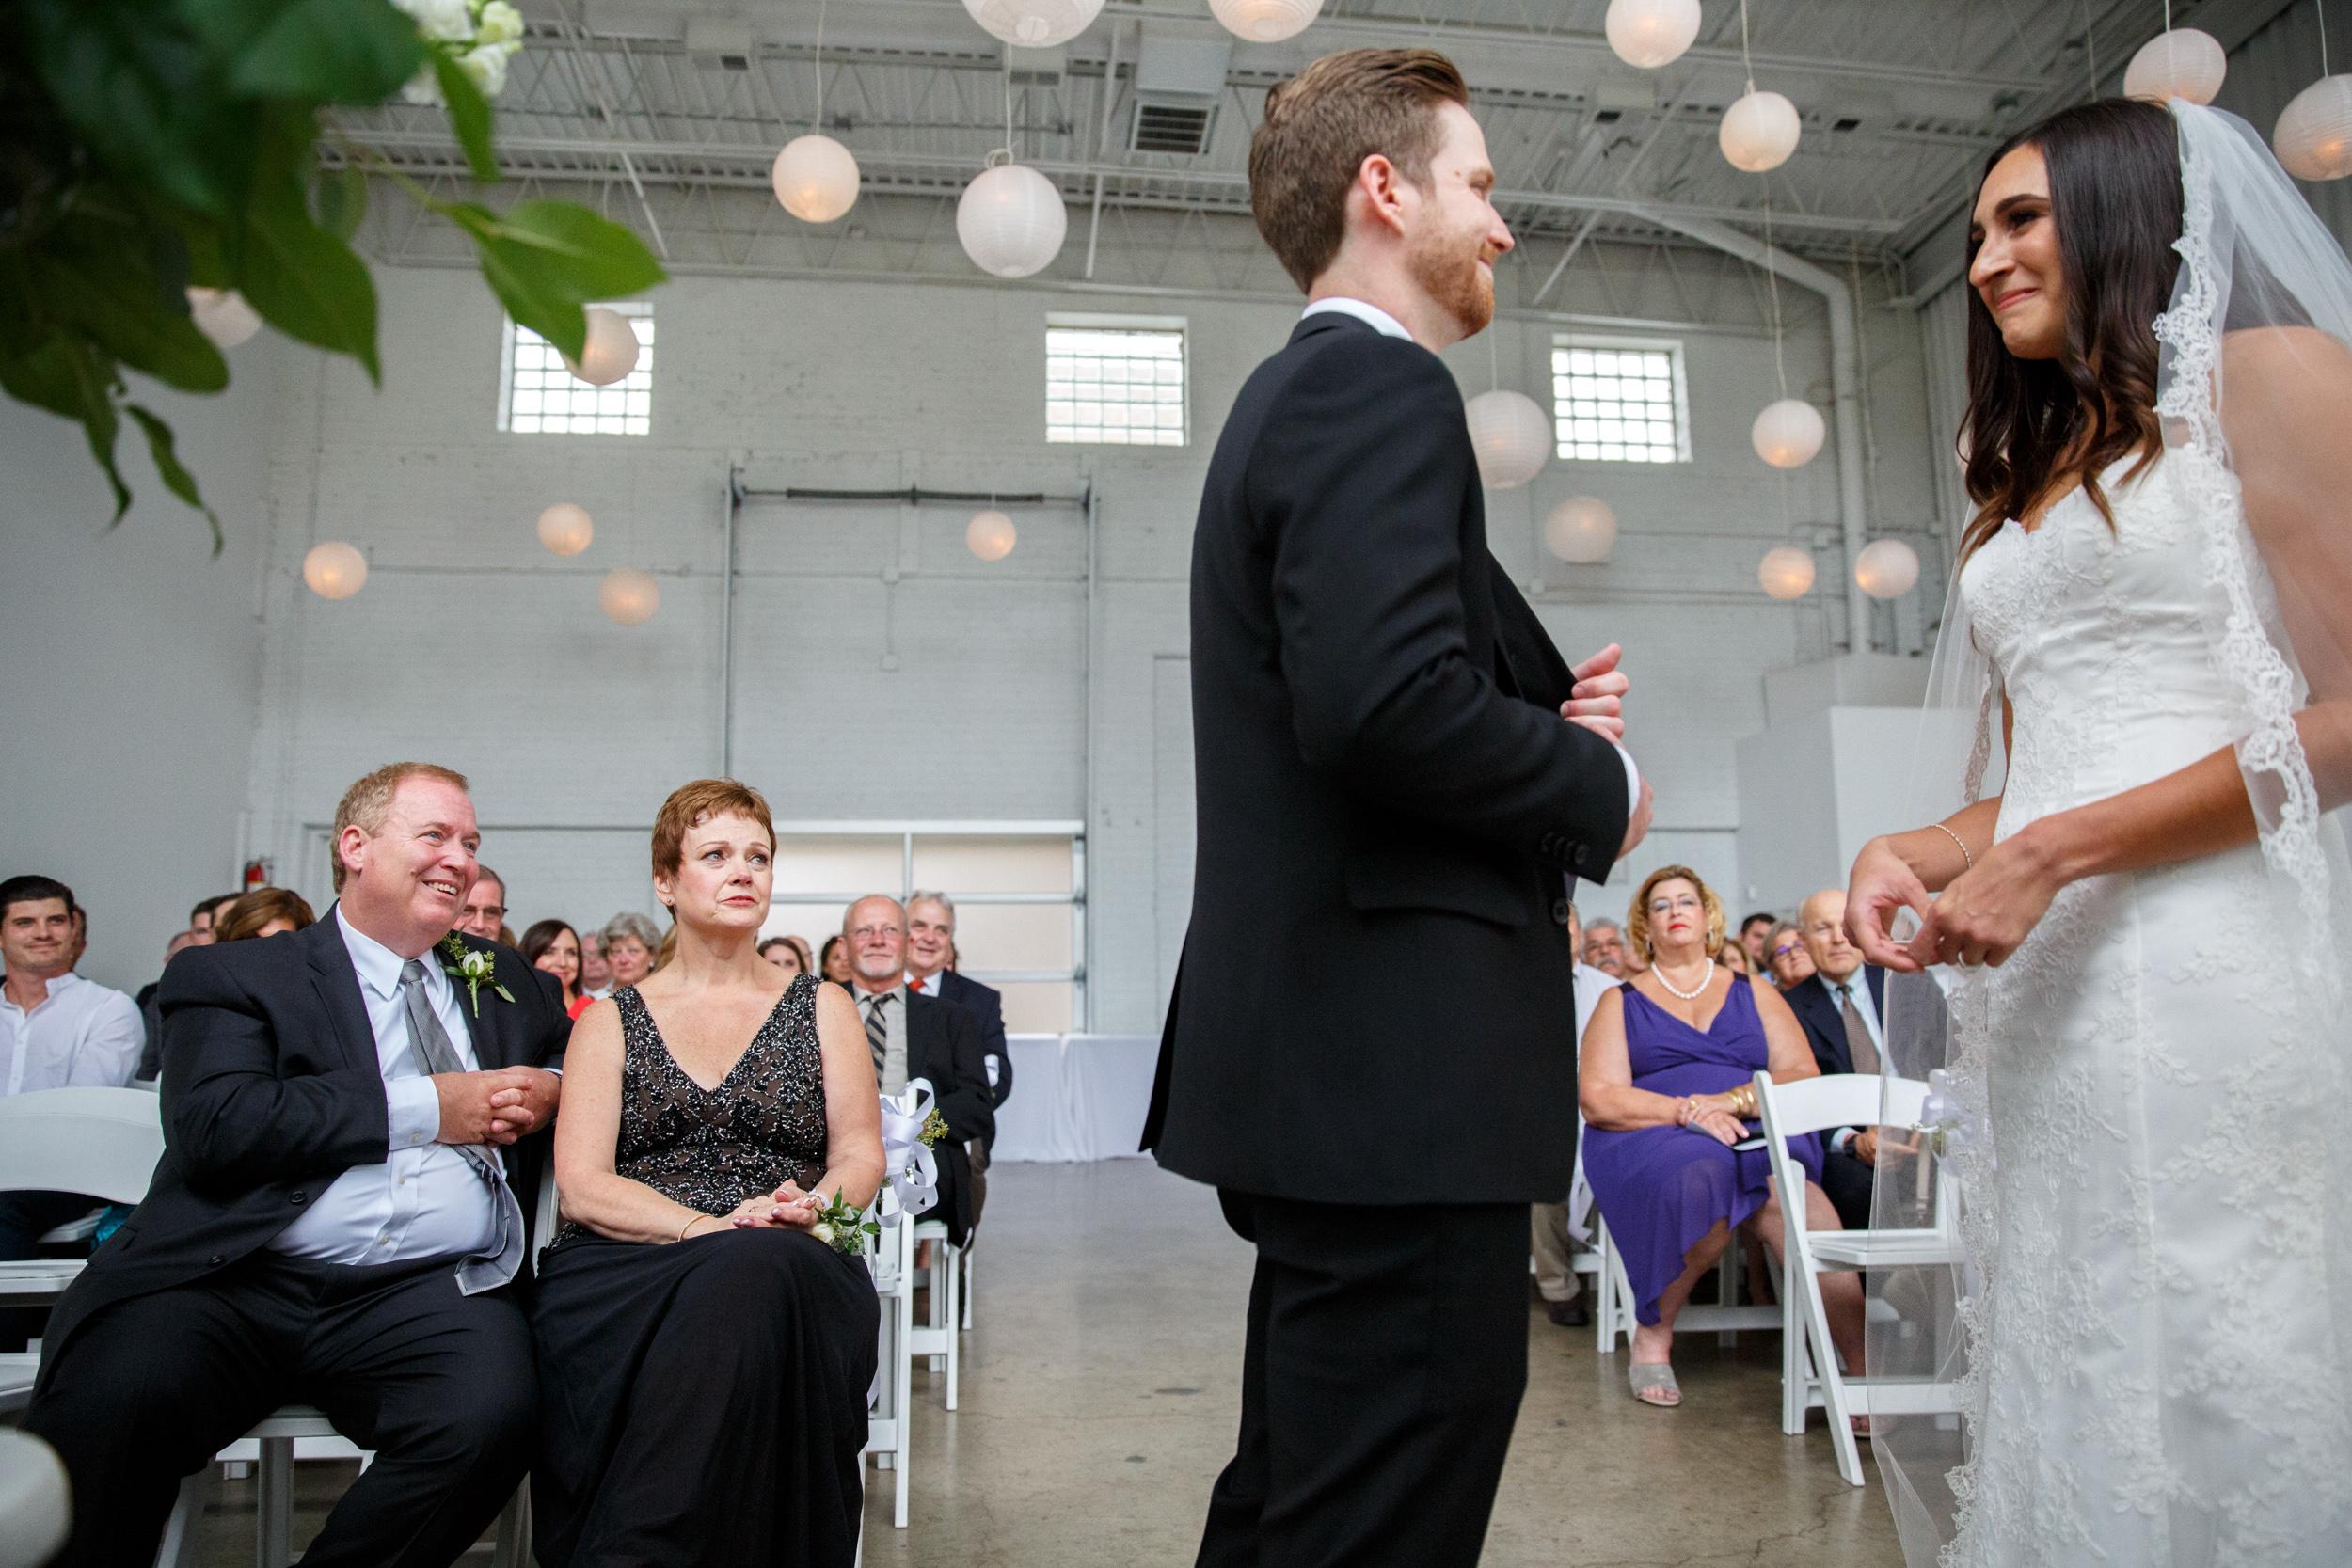 9-09-2016 Flora & Colin wedding photography by Brian Milo-152.jpg